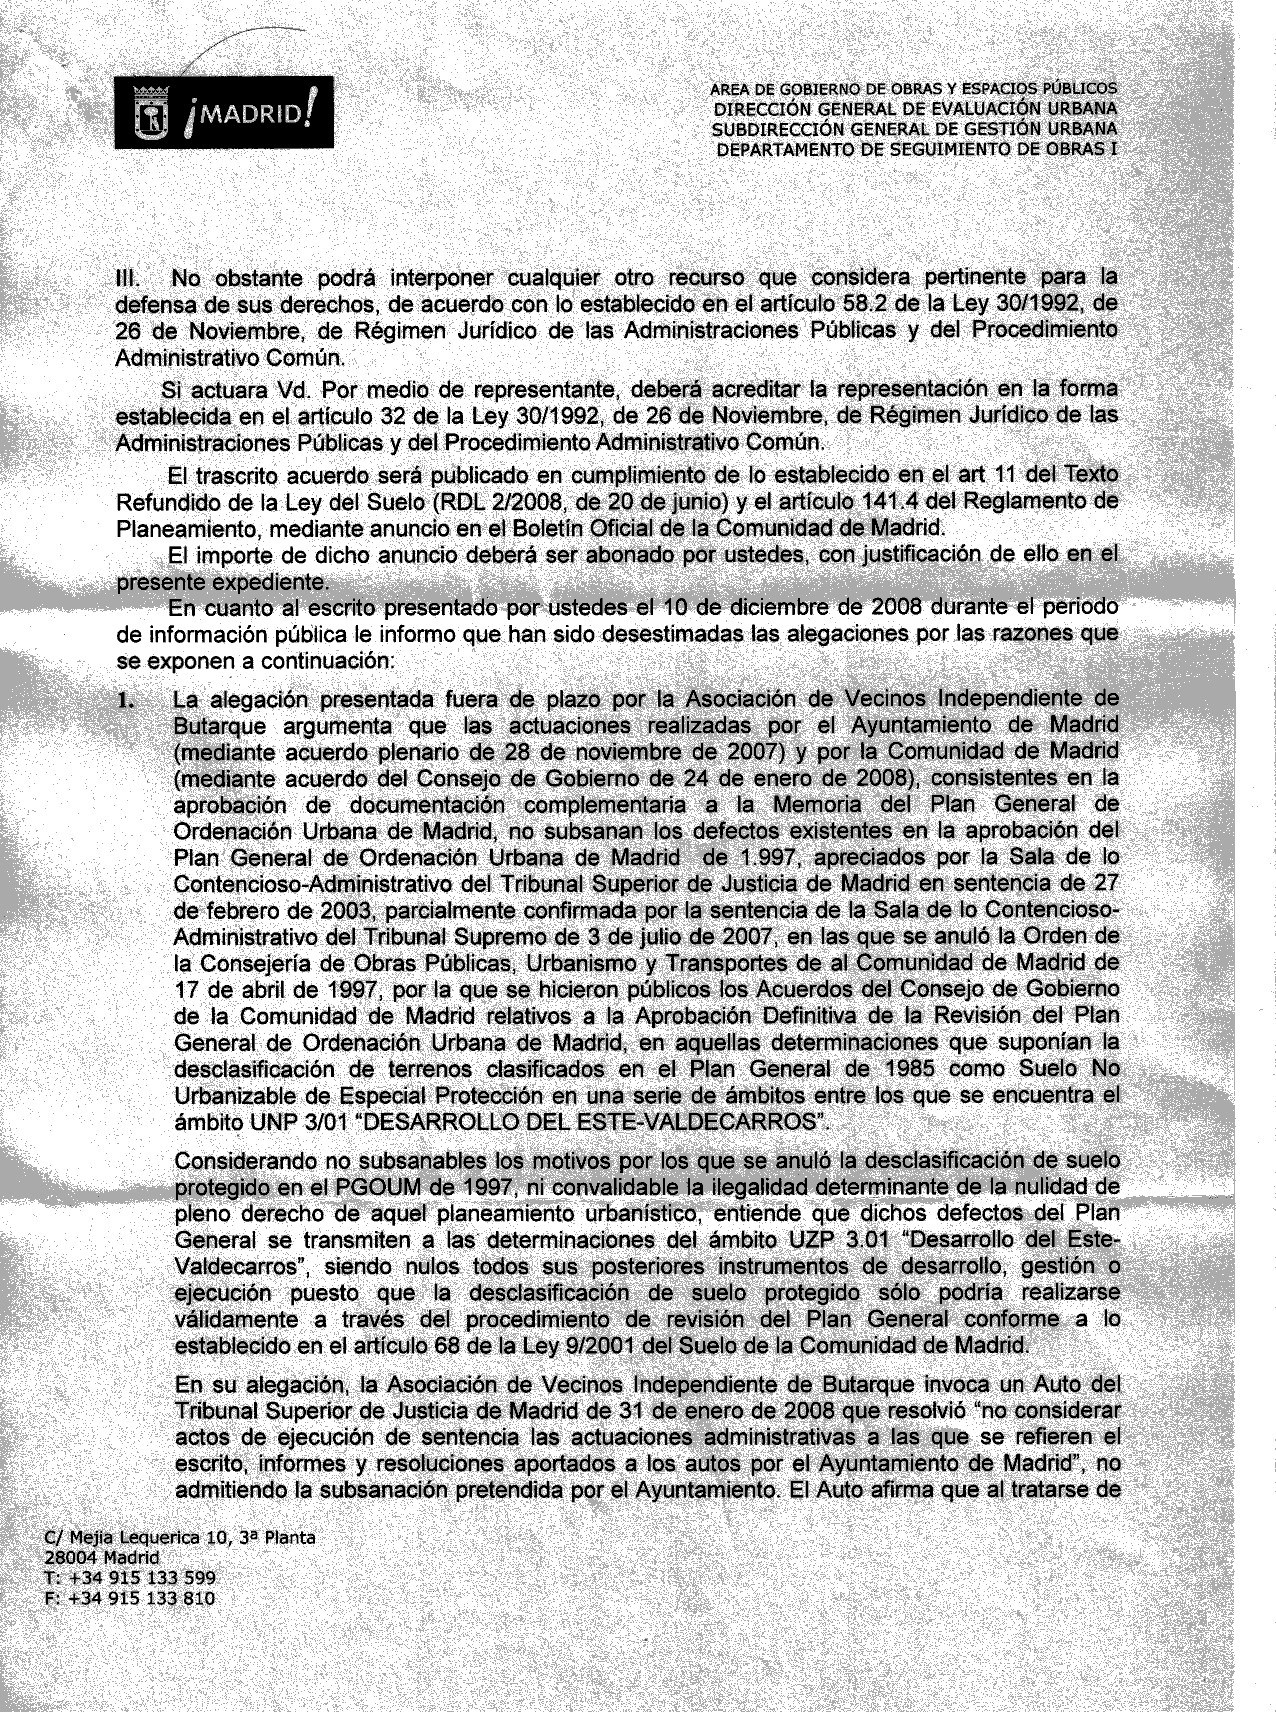 proyecto_Valdecarros-1.jpg